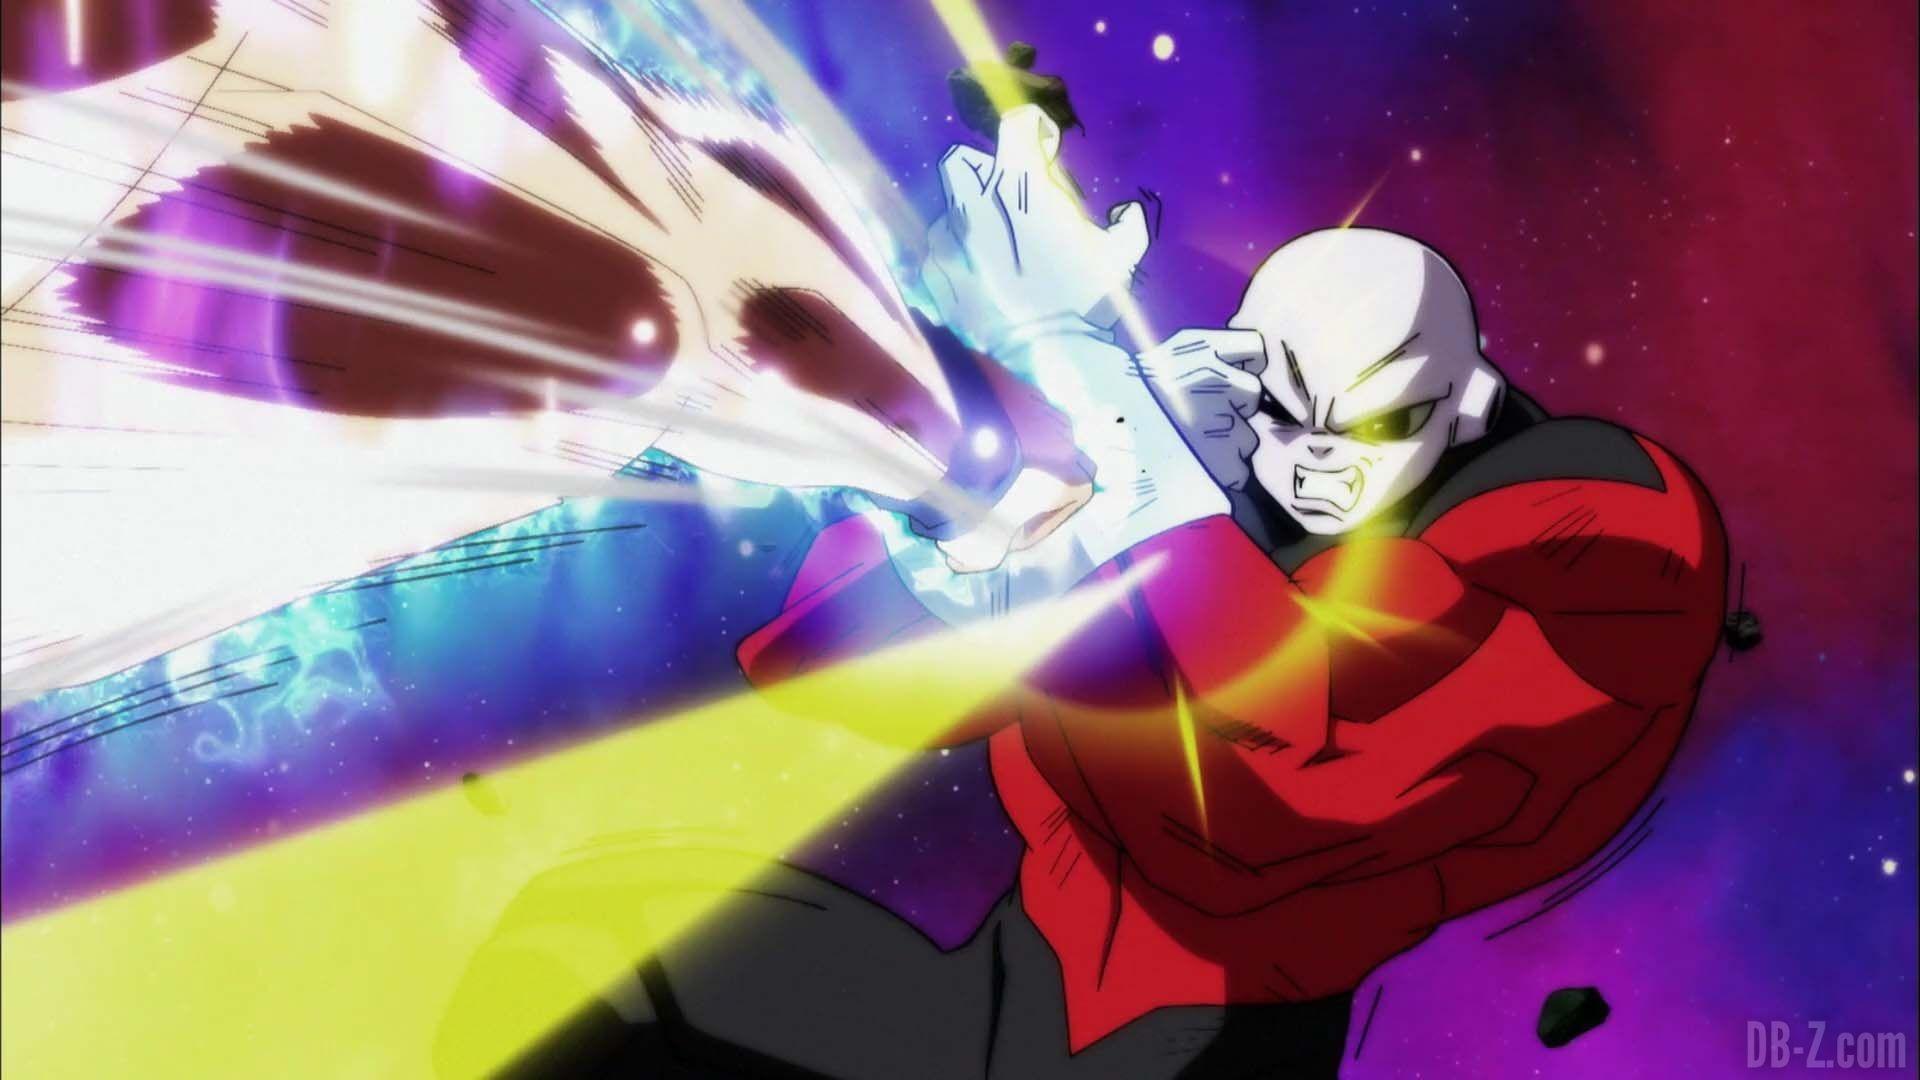 Pin By Vrishank Giri On Dragon Ball Super Anime Dragon Ball Dragon Ball Dragon Ball Super